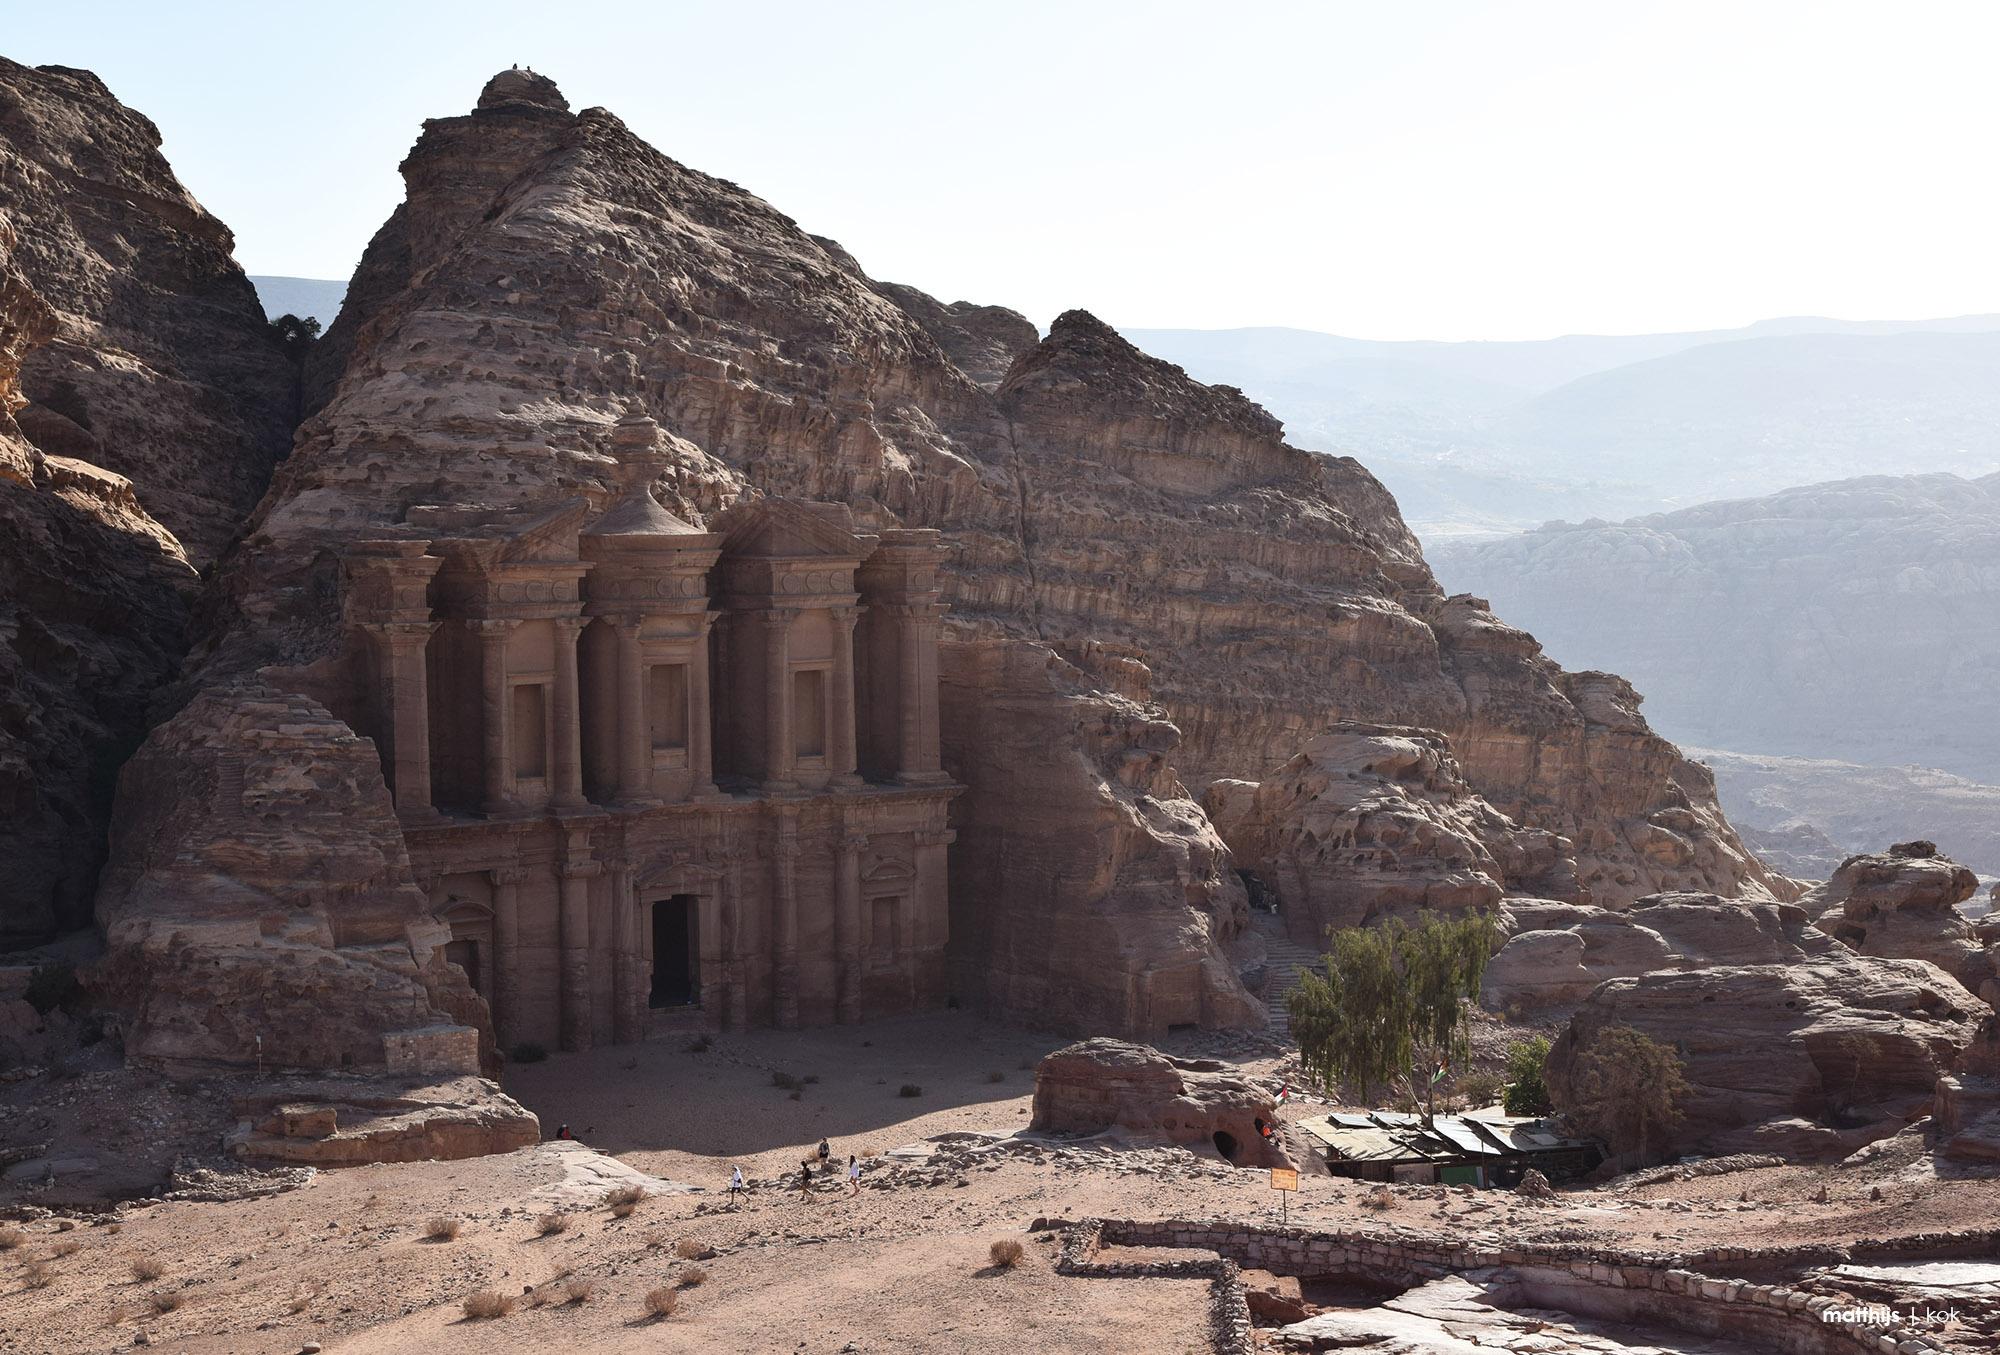 Ad Deir Monastery, Petra, Jordan | Photography by Matthijs Kok